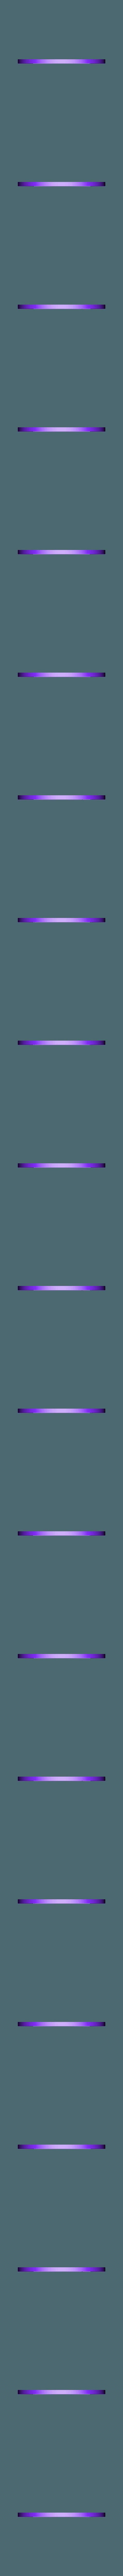 Spurs_black.STL Download free STL file Minimal Multi-color NBA coasters • 3D print object, MosaicManufacturing